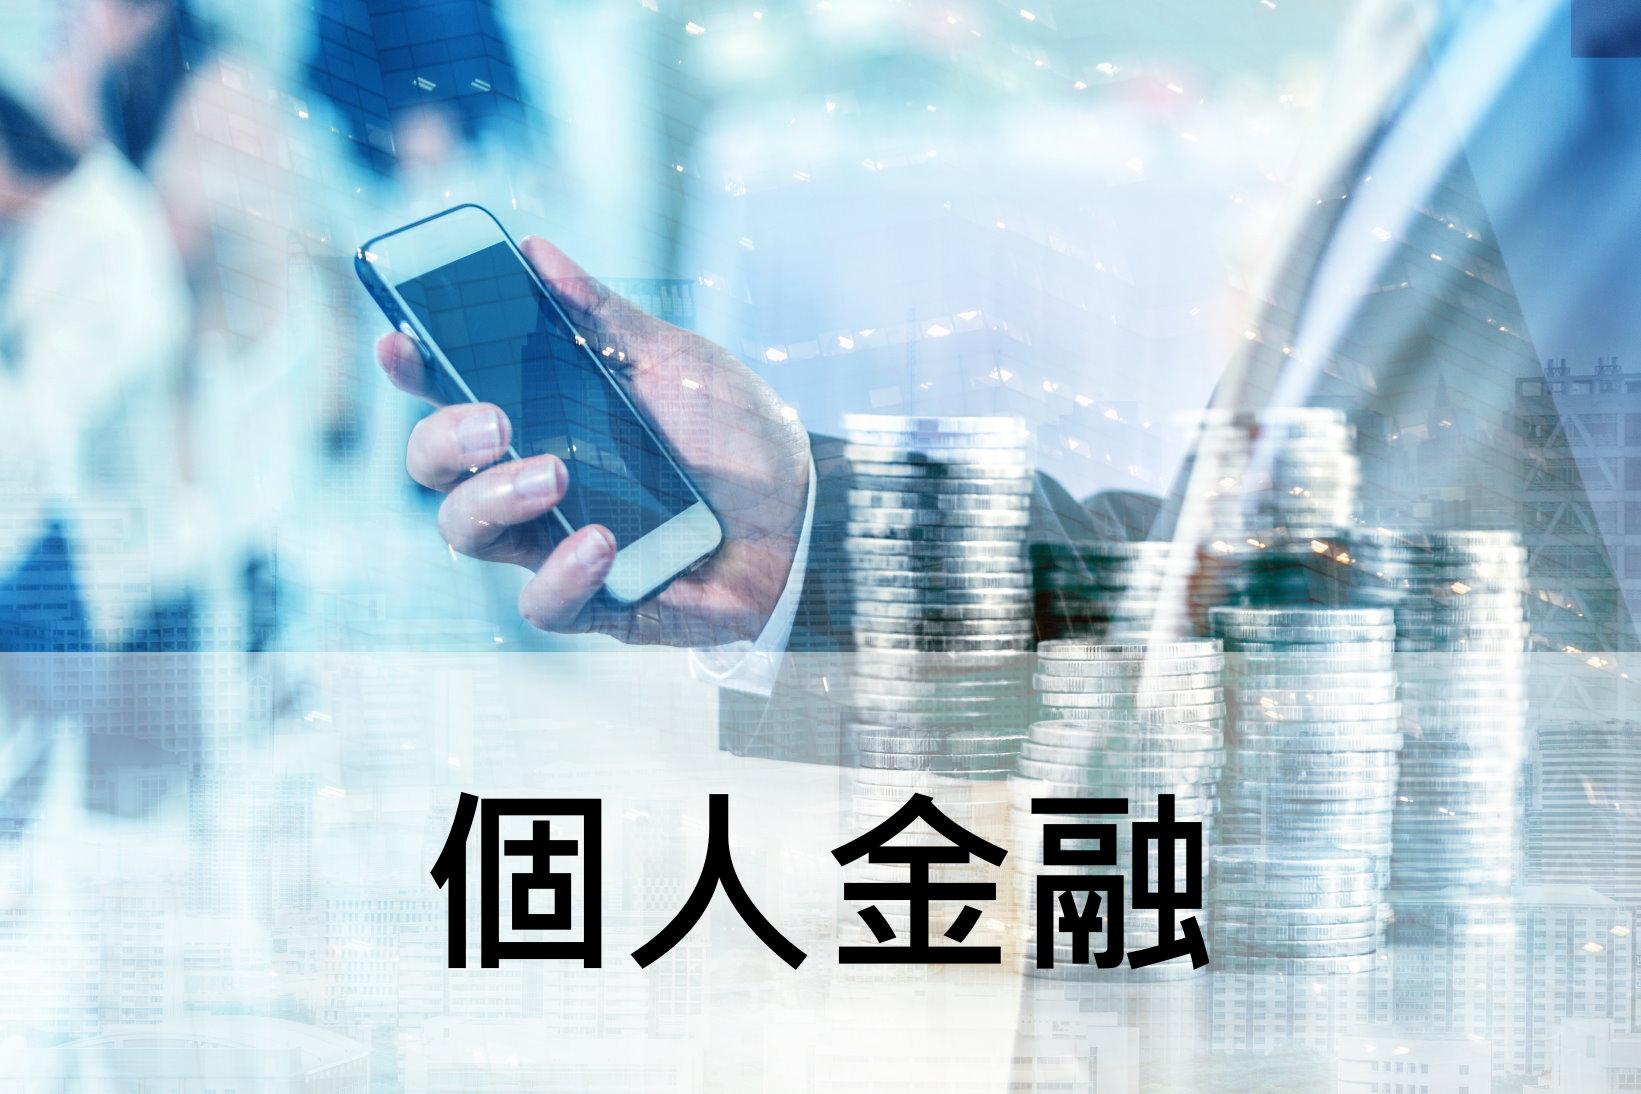 Digital Finance 08 26 04